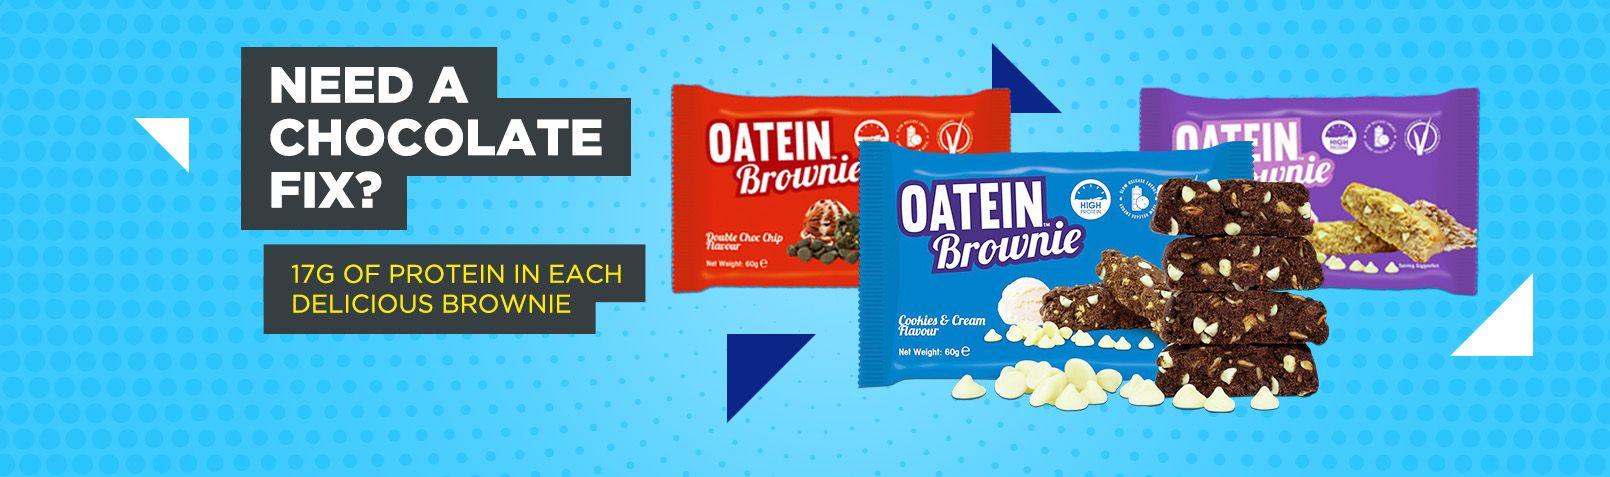 Proteínová sušienka Oatein Brownie 60 g - Oatein